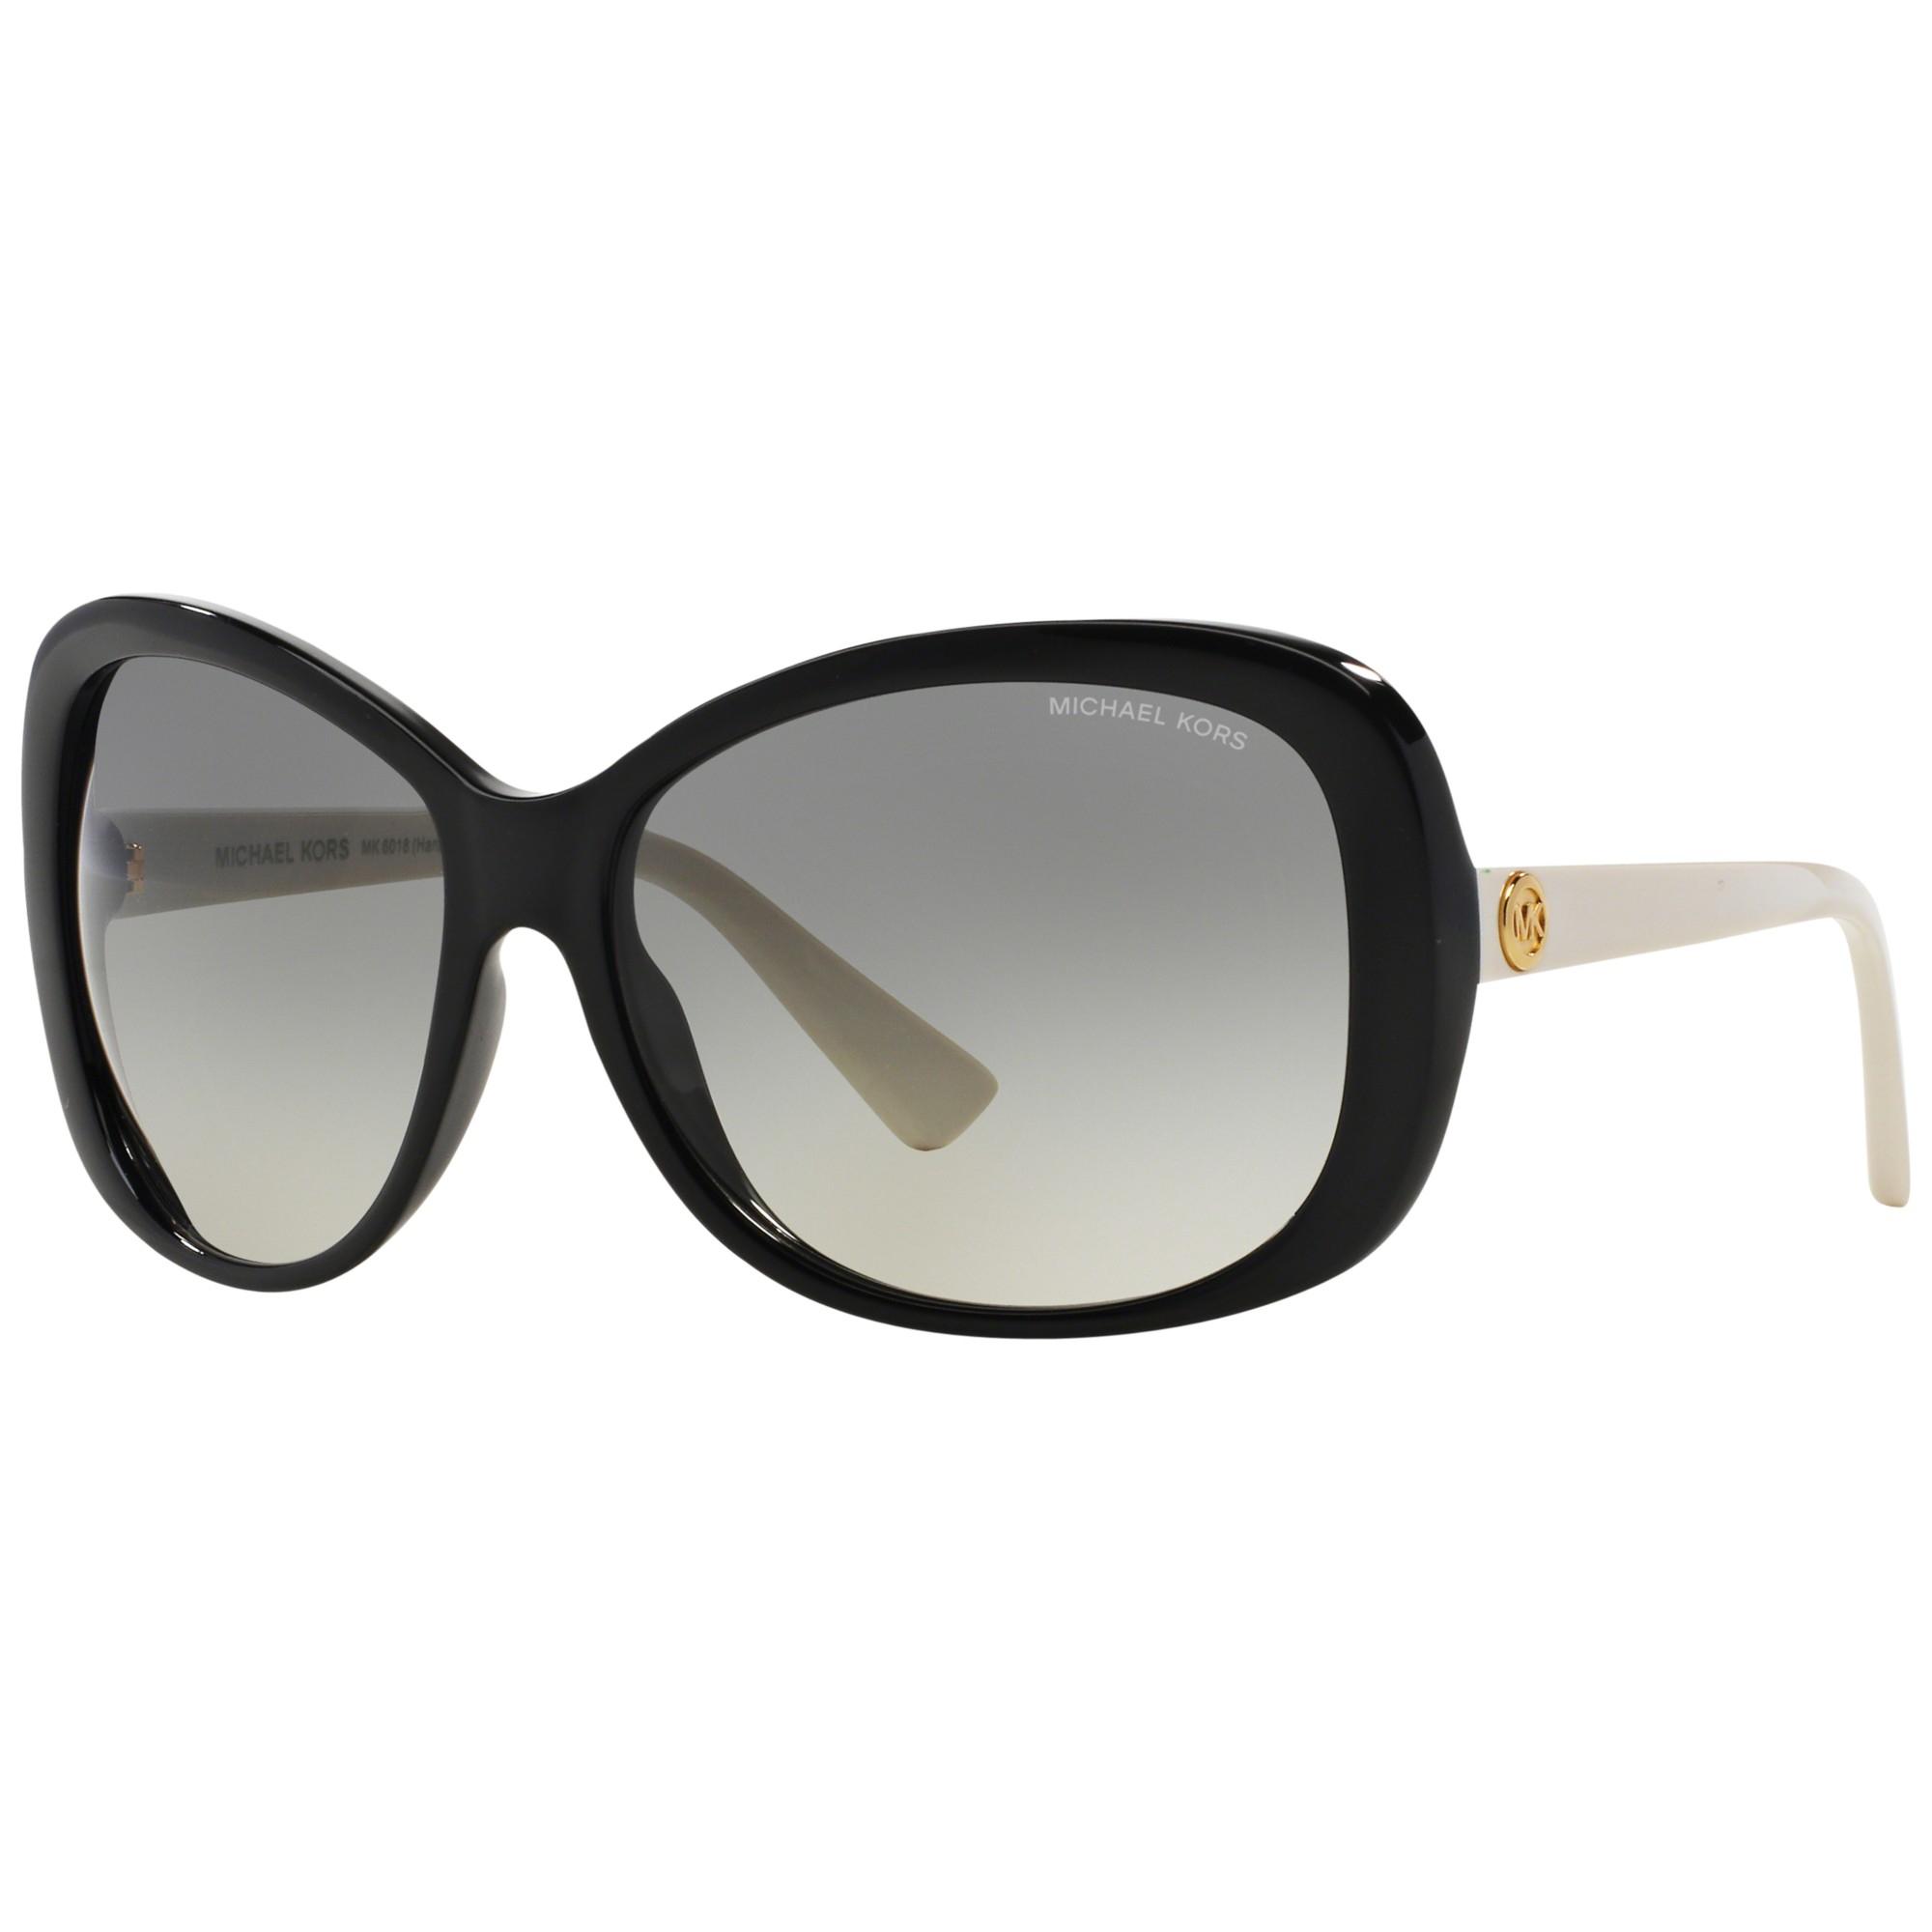 77fab36ac0 Michael Kors Mk6018 Butterfly Framed Sunglasses in Black - Lyst